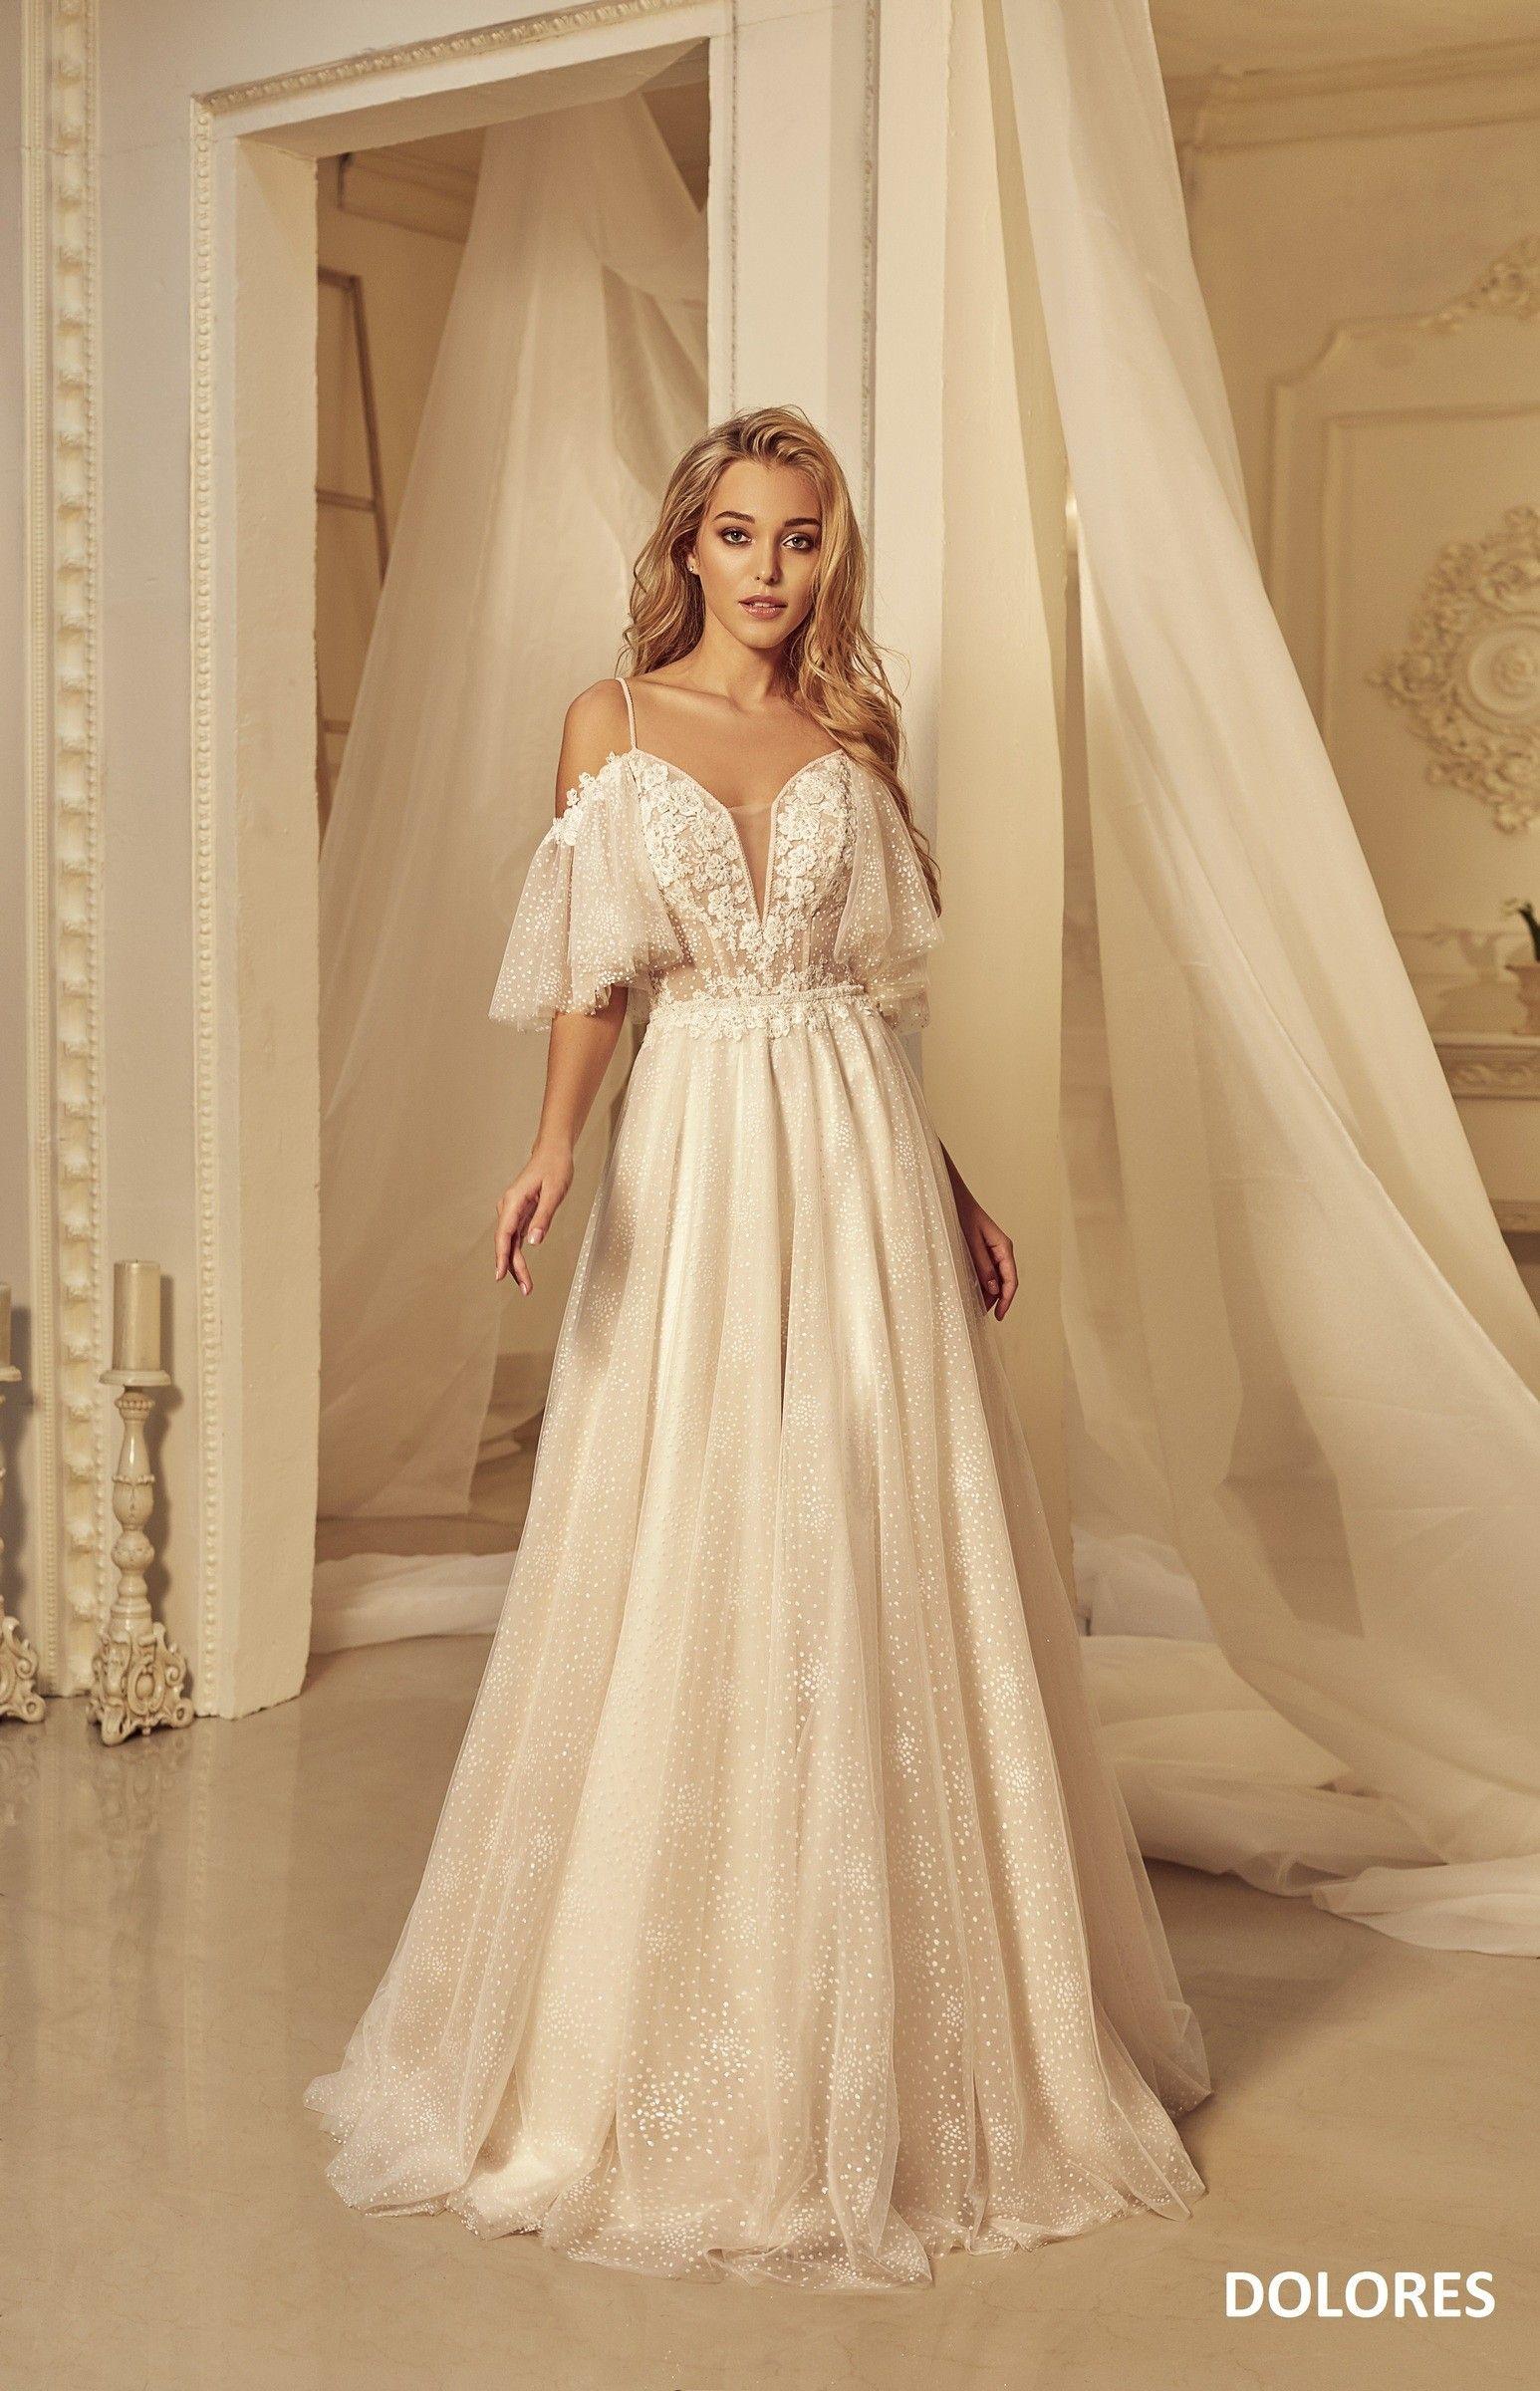 Vero Bloom Dolores In 2020 Wedding Dresses Wedding Dresses Lace Wedding Salon